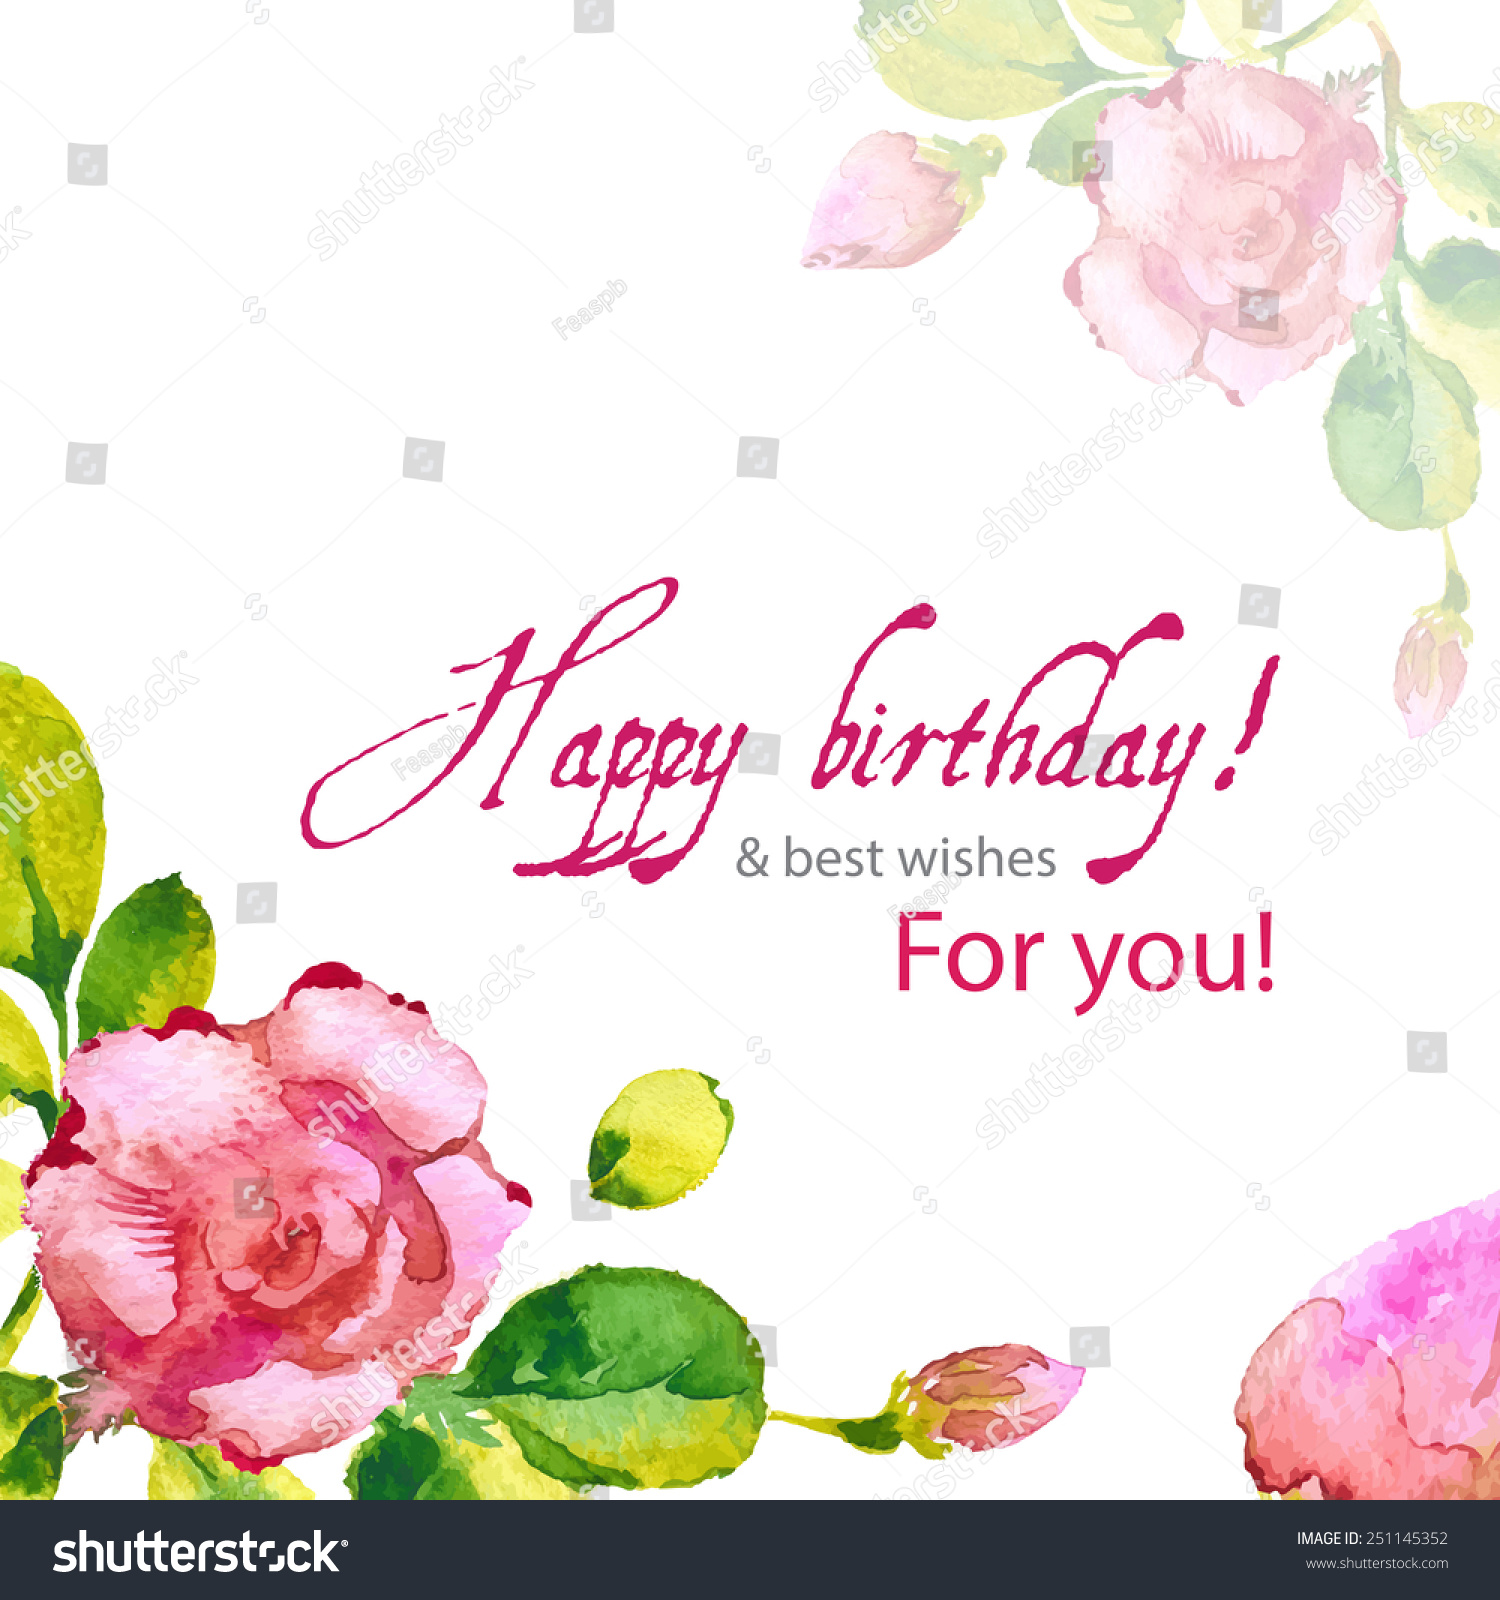 Happy birthday vintage flower card vector stock vector 251145352 happy birthday vintage flower card vector stock vector 251145352 shutterstock izmirmasajfo